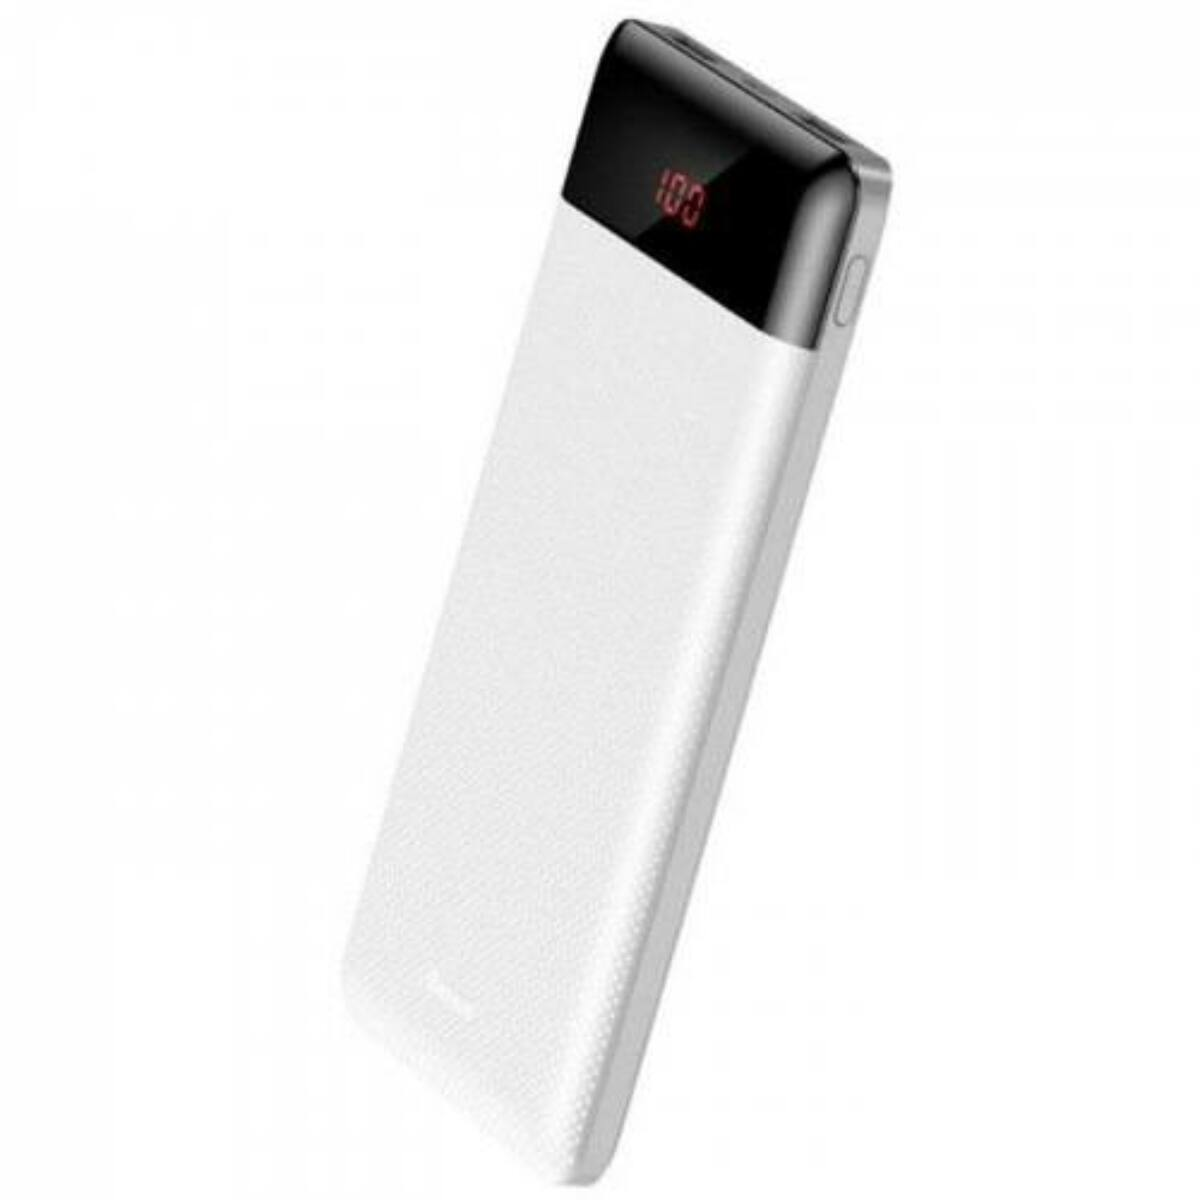 Baseus Power Bank Mini Cu, digitális kijelző (Micro USB bemenet / dupla USB kimenet), 2.1A, 10.000 mAh, fehér (PPALL-AKU02)